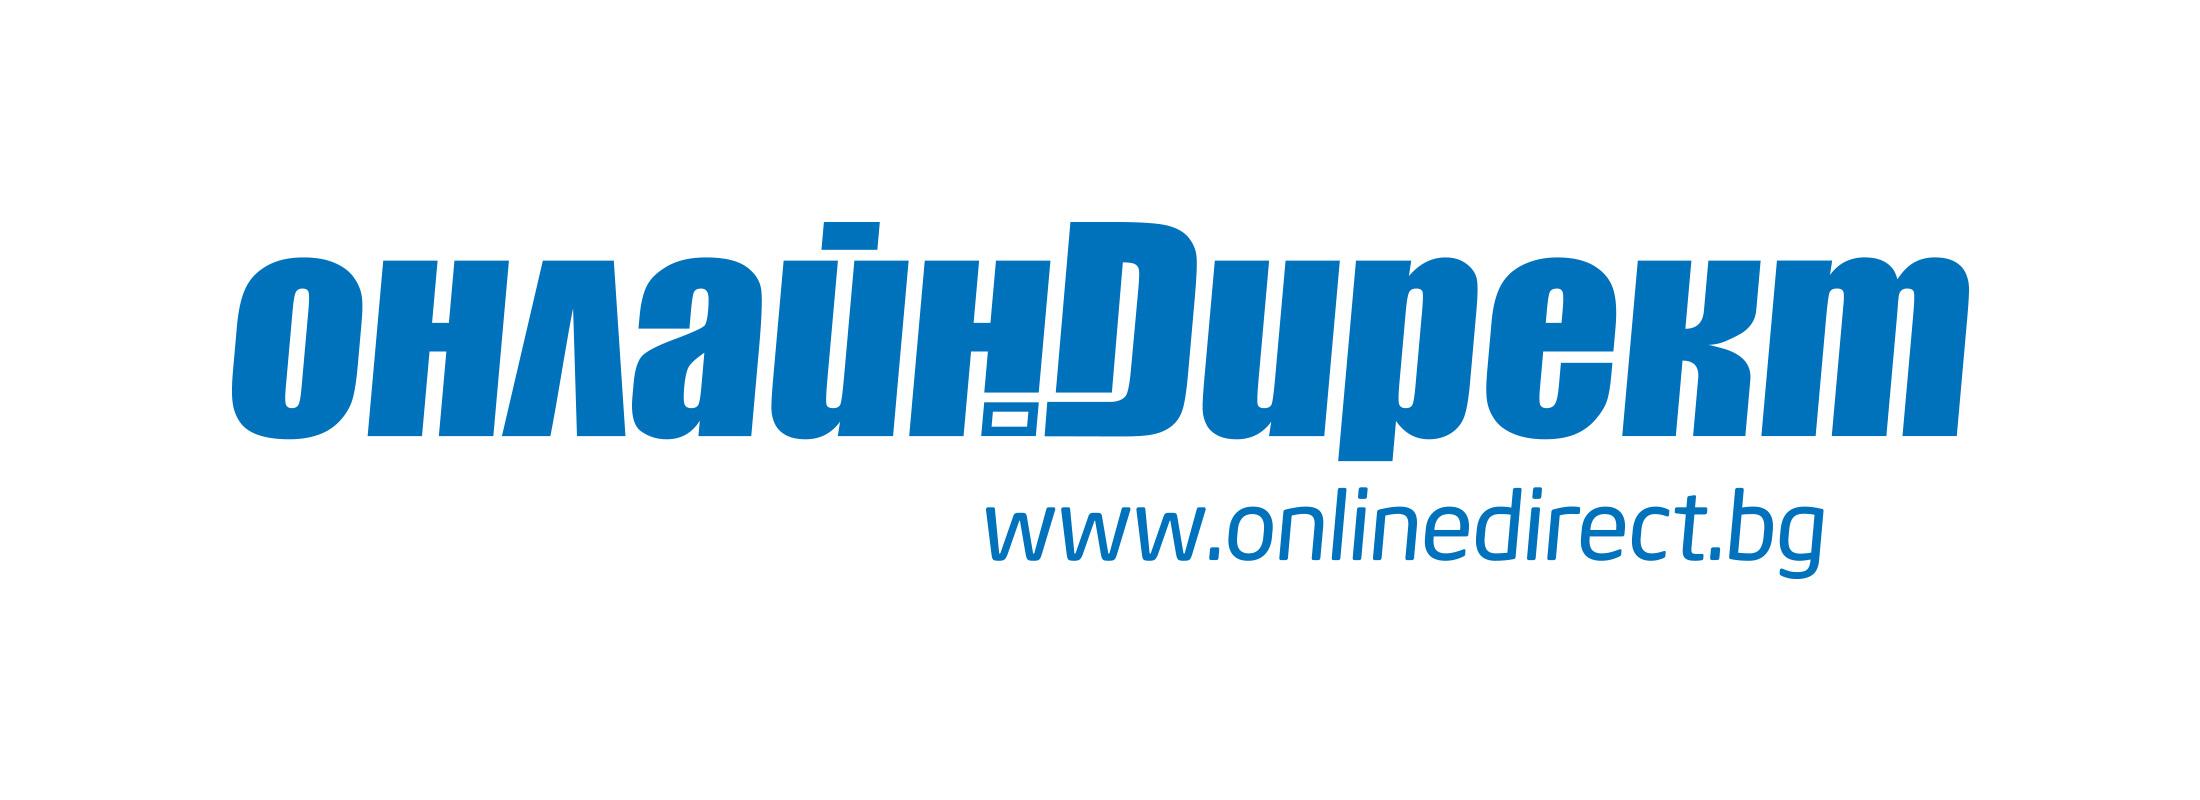 online direct